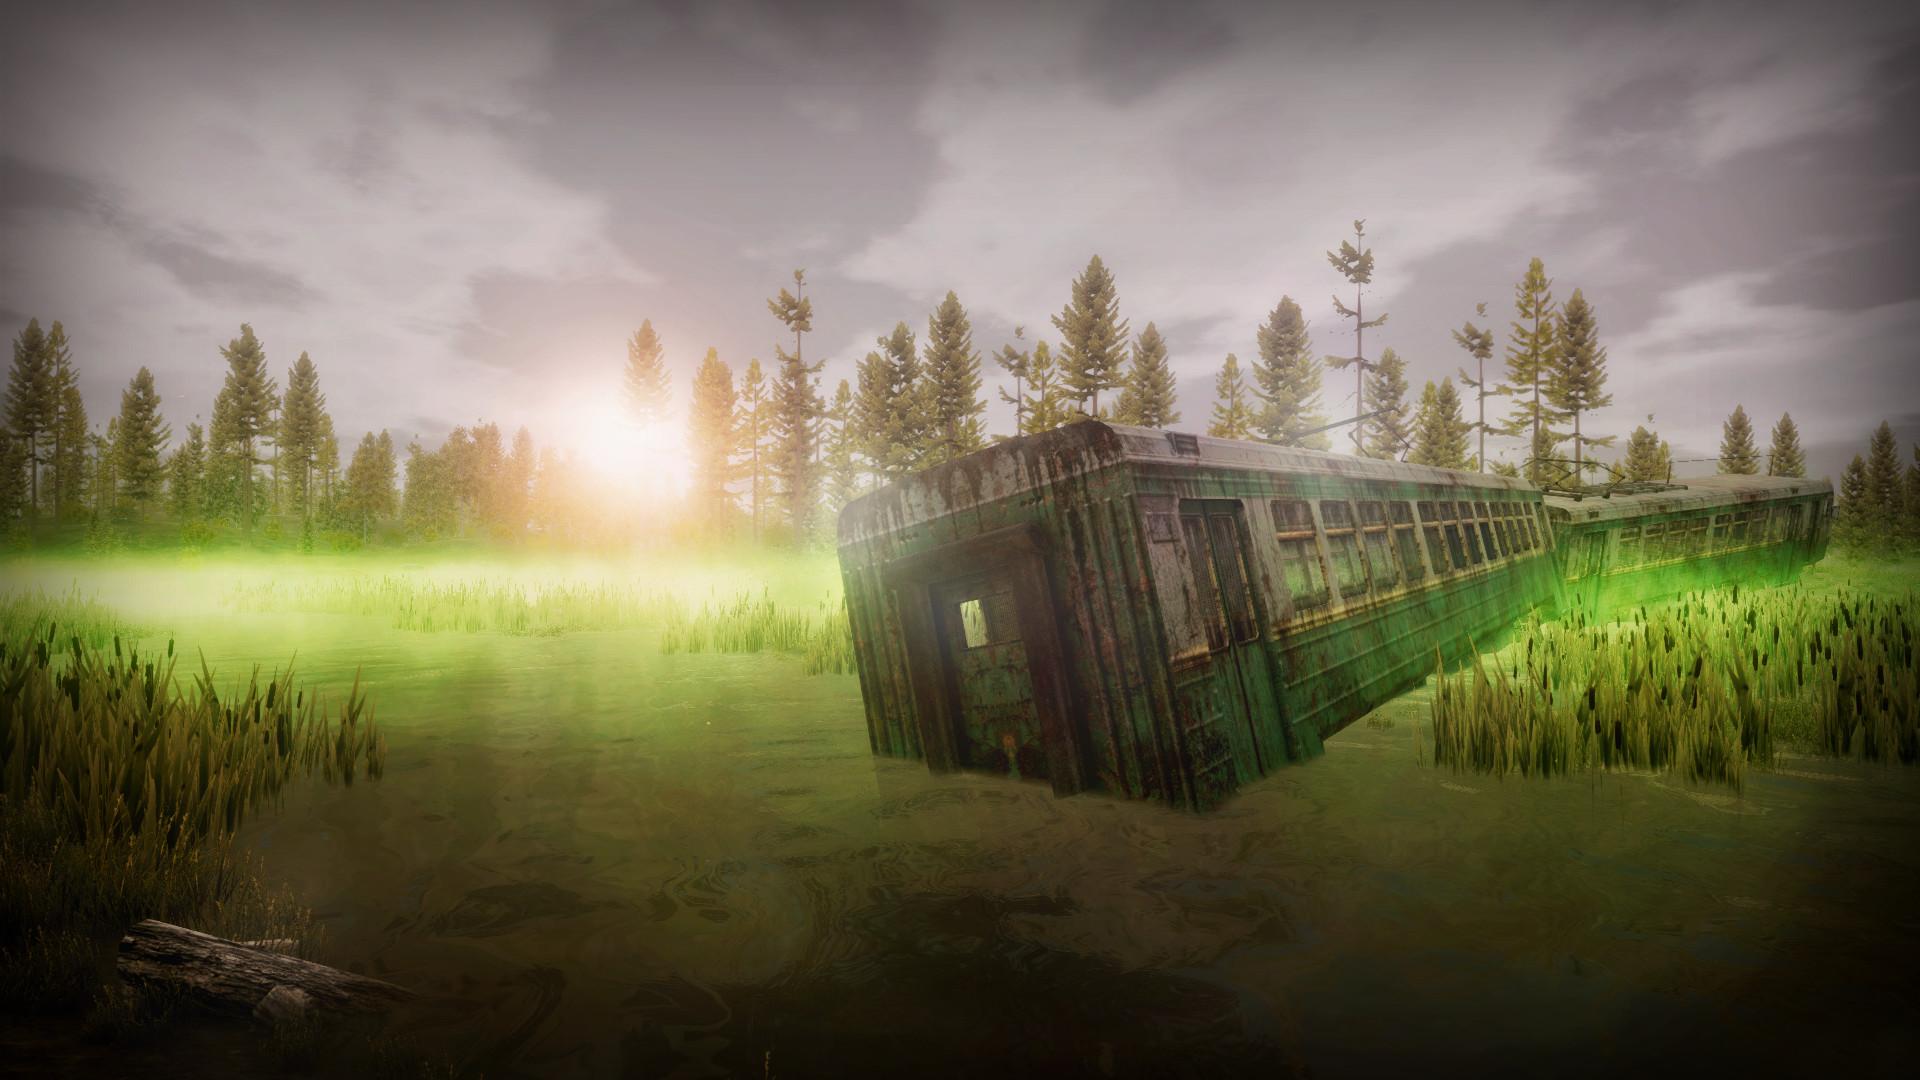 mist survival 0.2.2 download